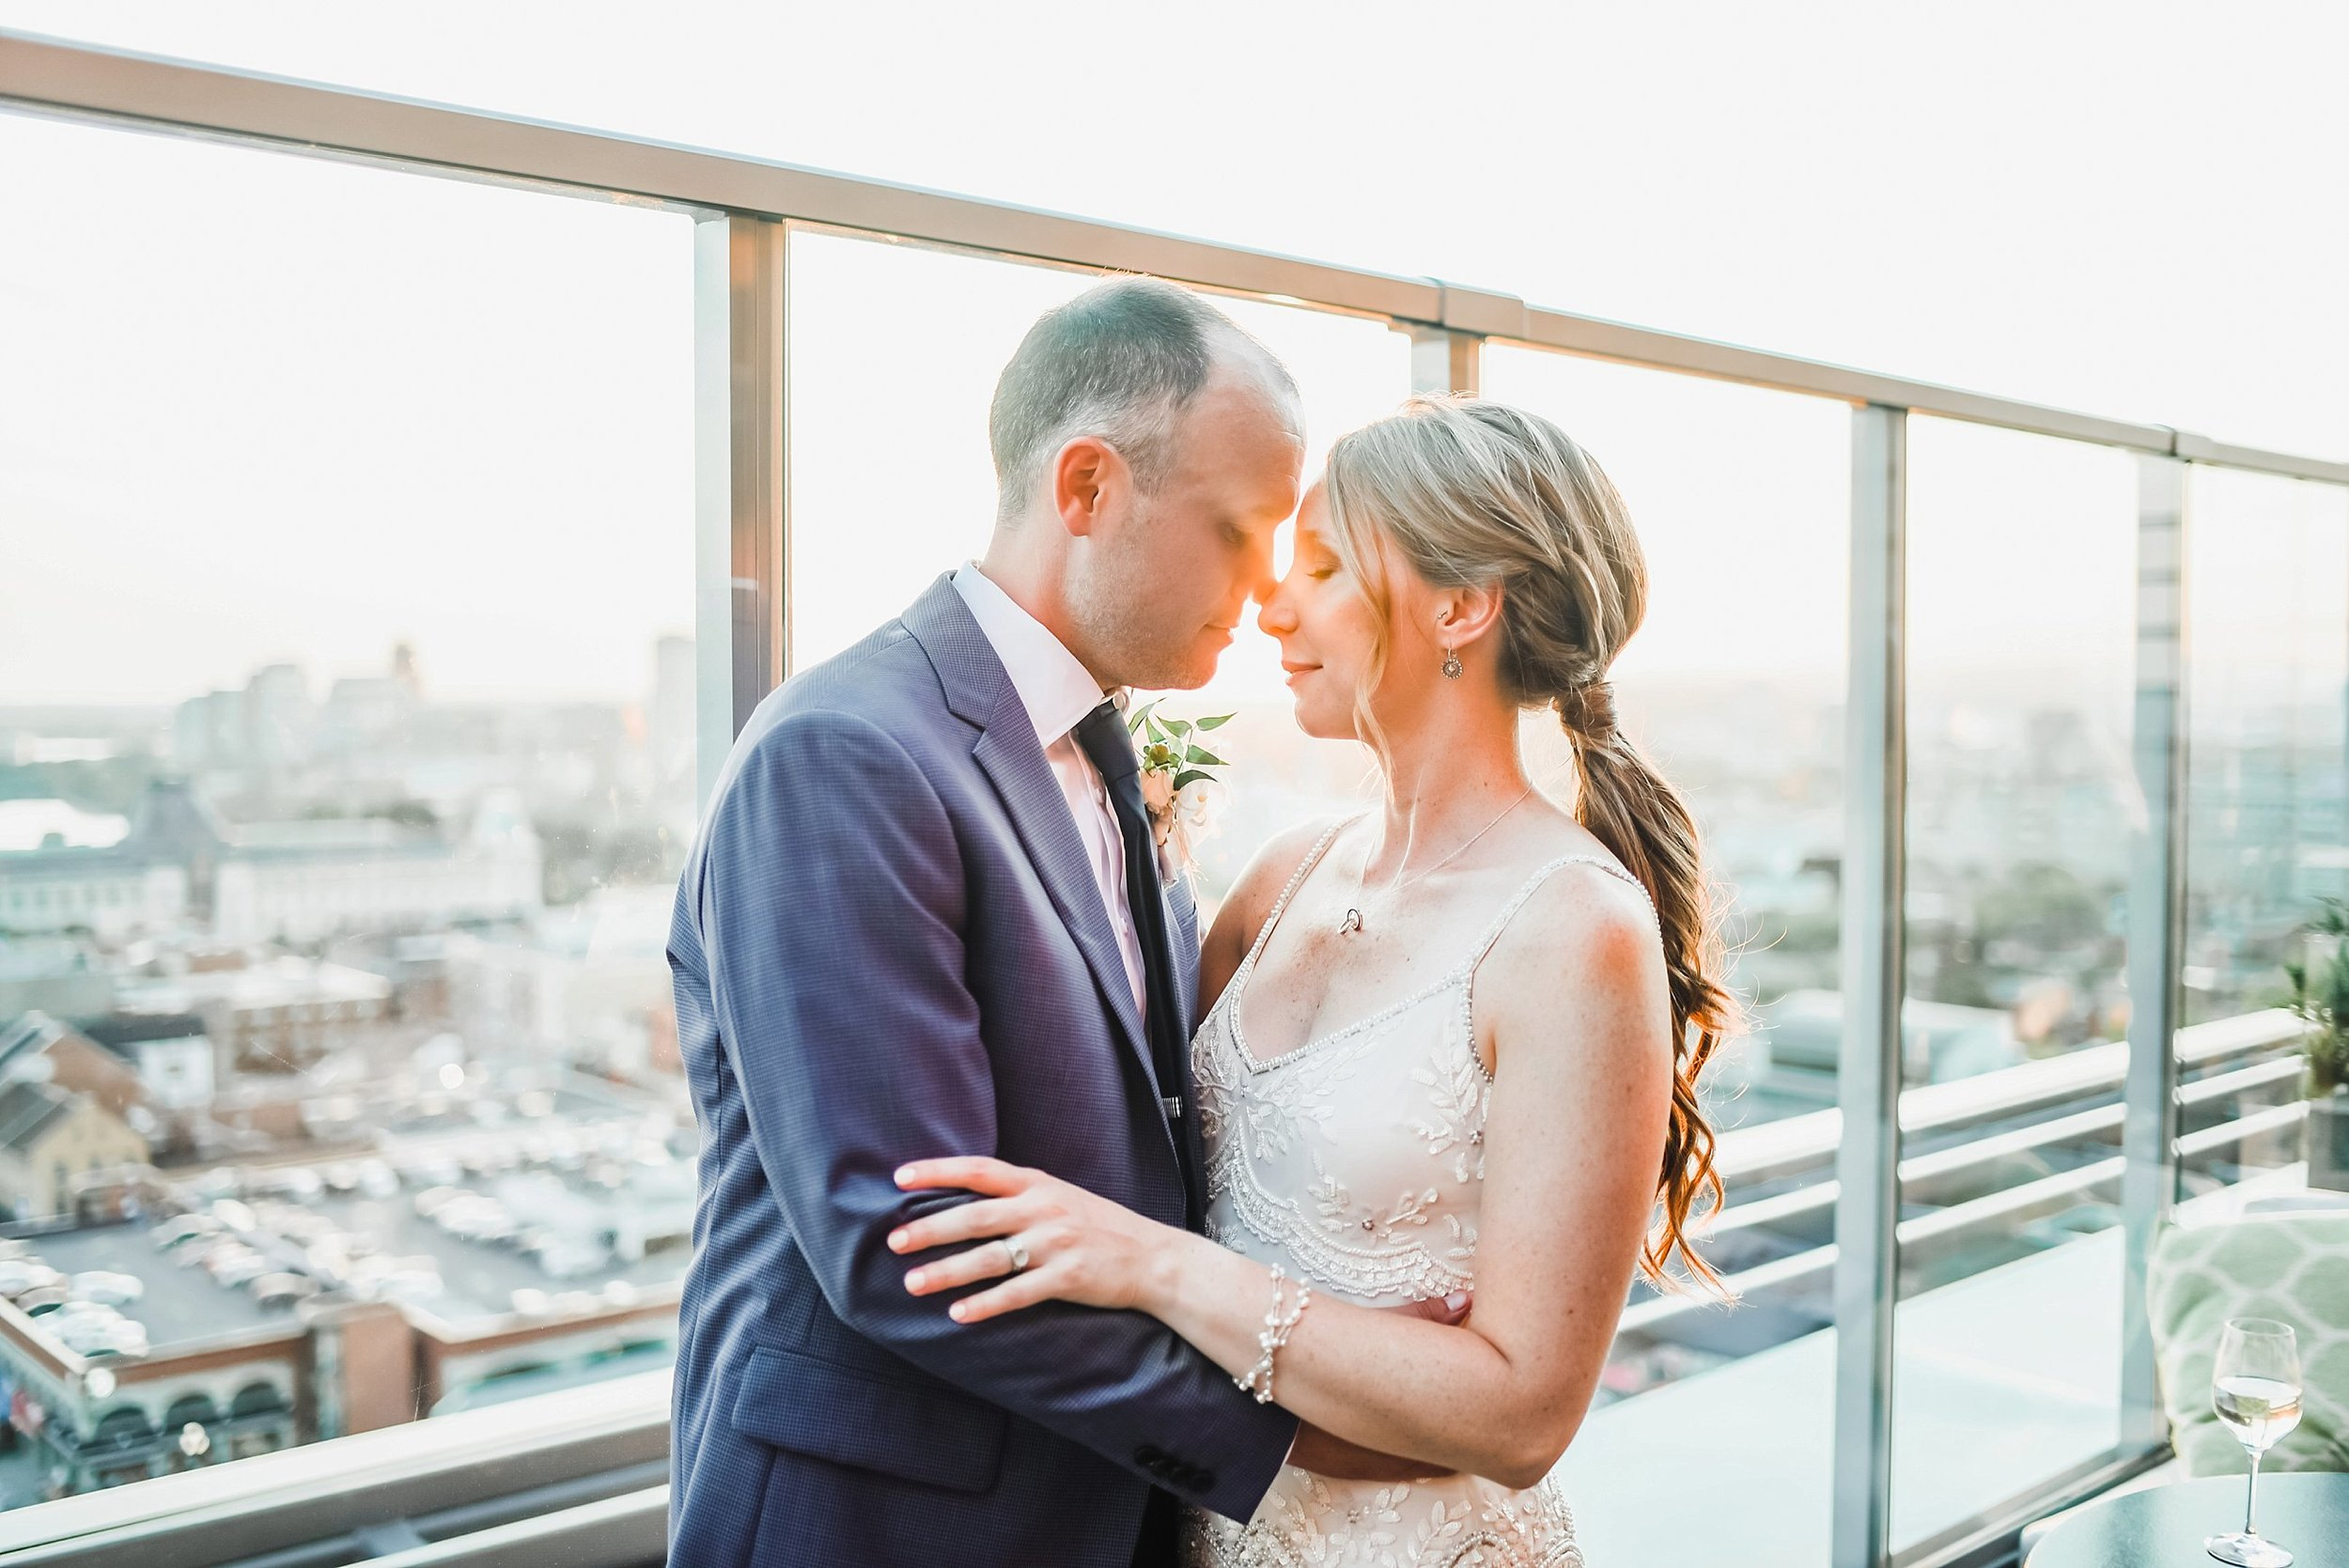 light airy indie fine art ottawa wedding photographer | Ali and Batoul Photography_0703.jpg